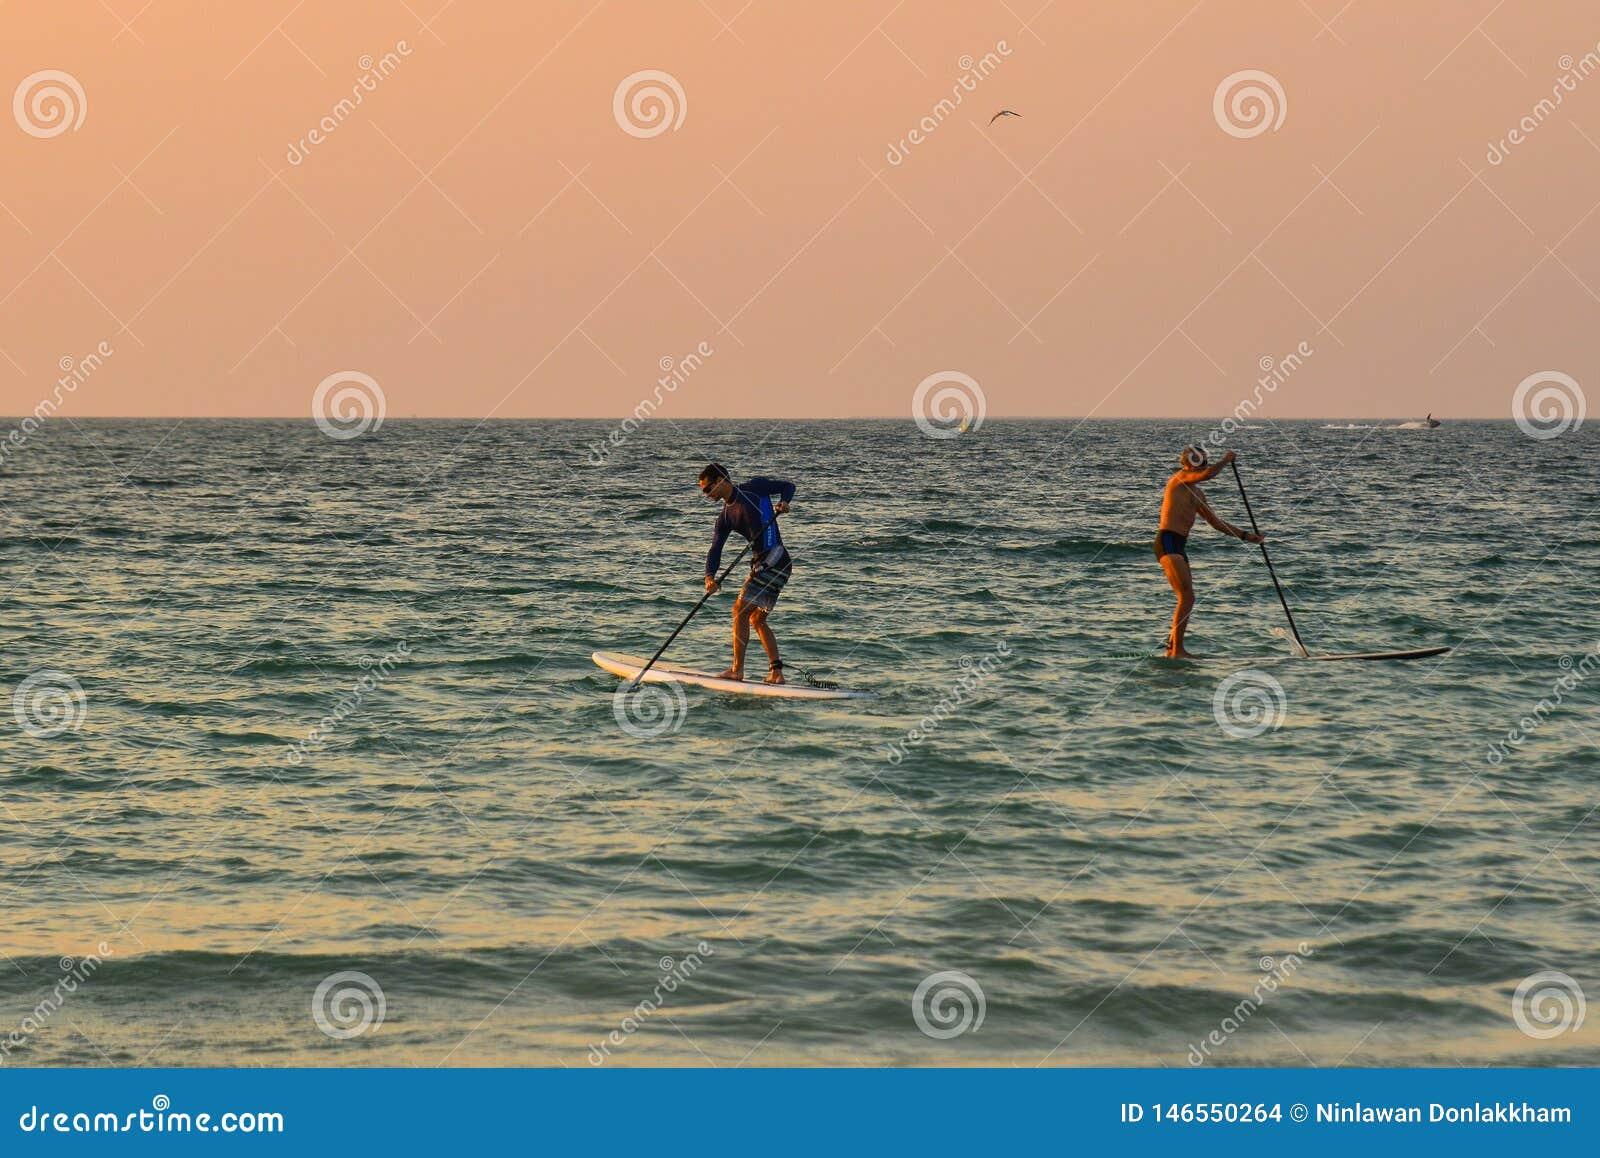 Turistas que kayaking no mar no por do sol